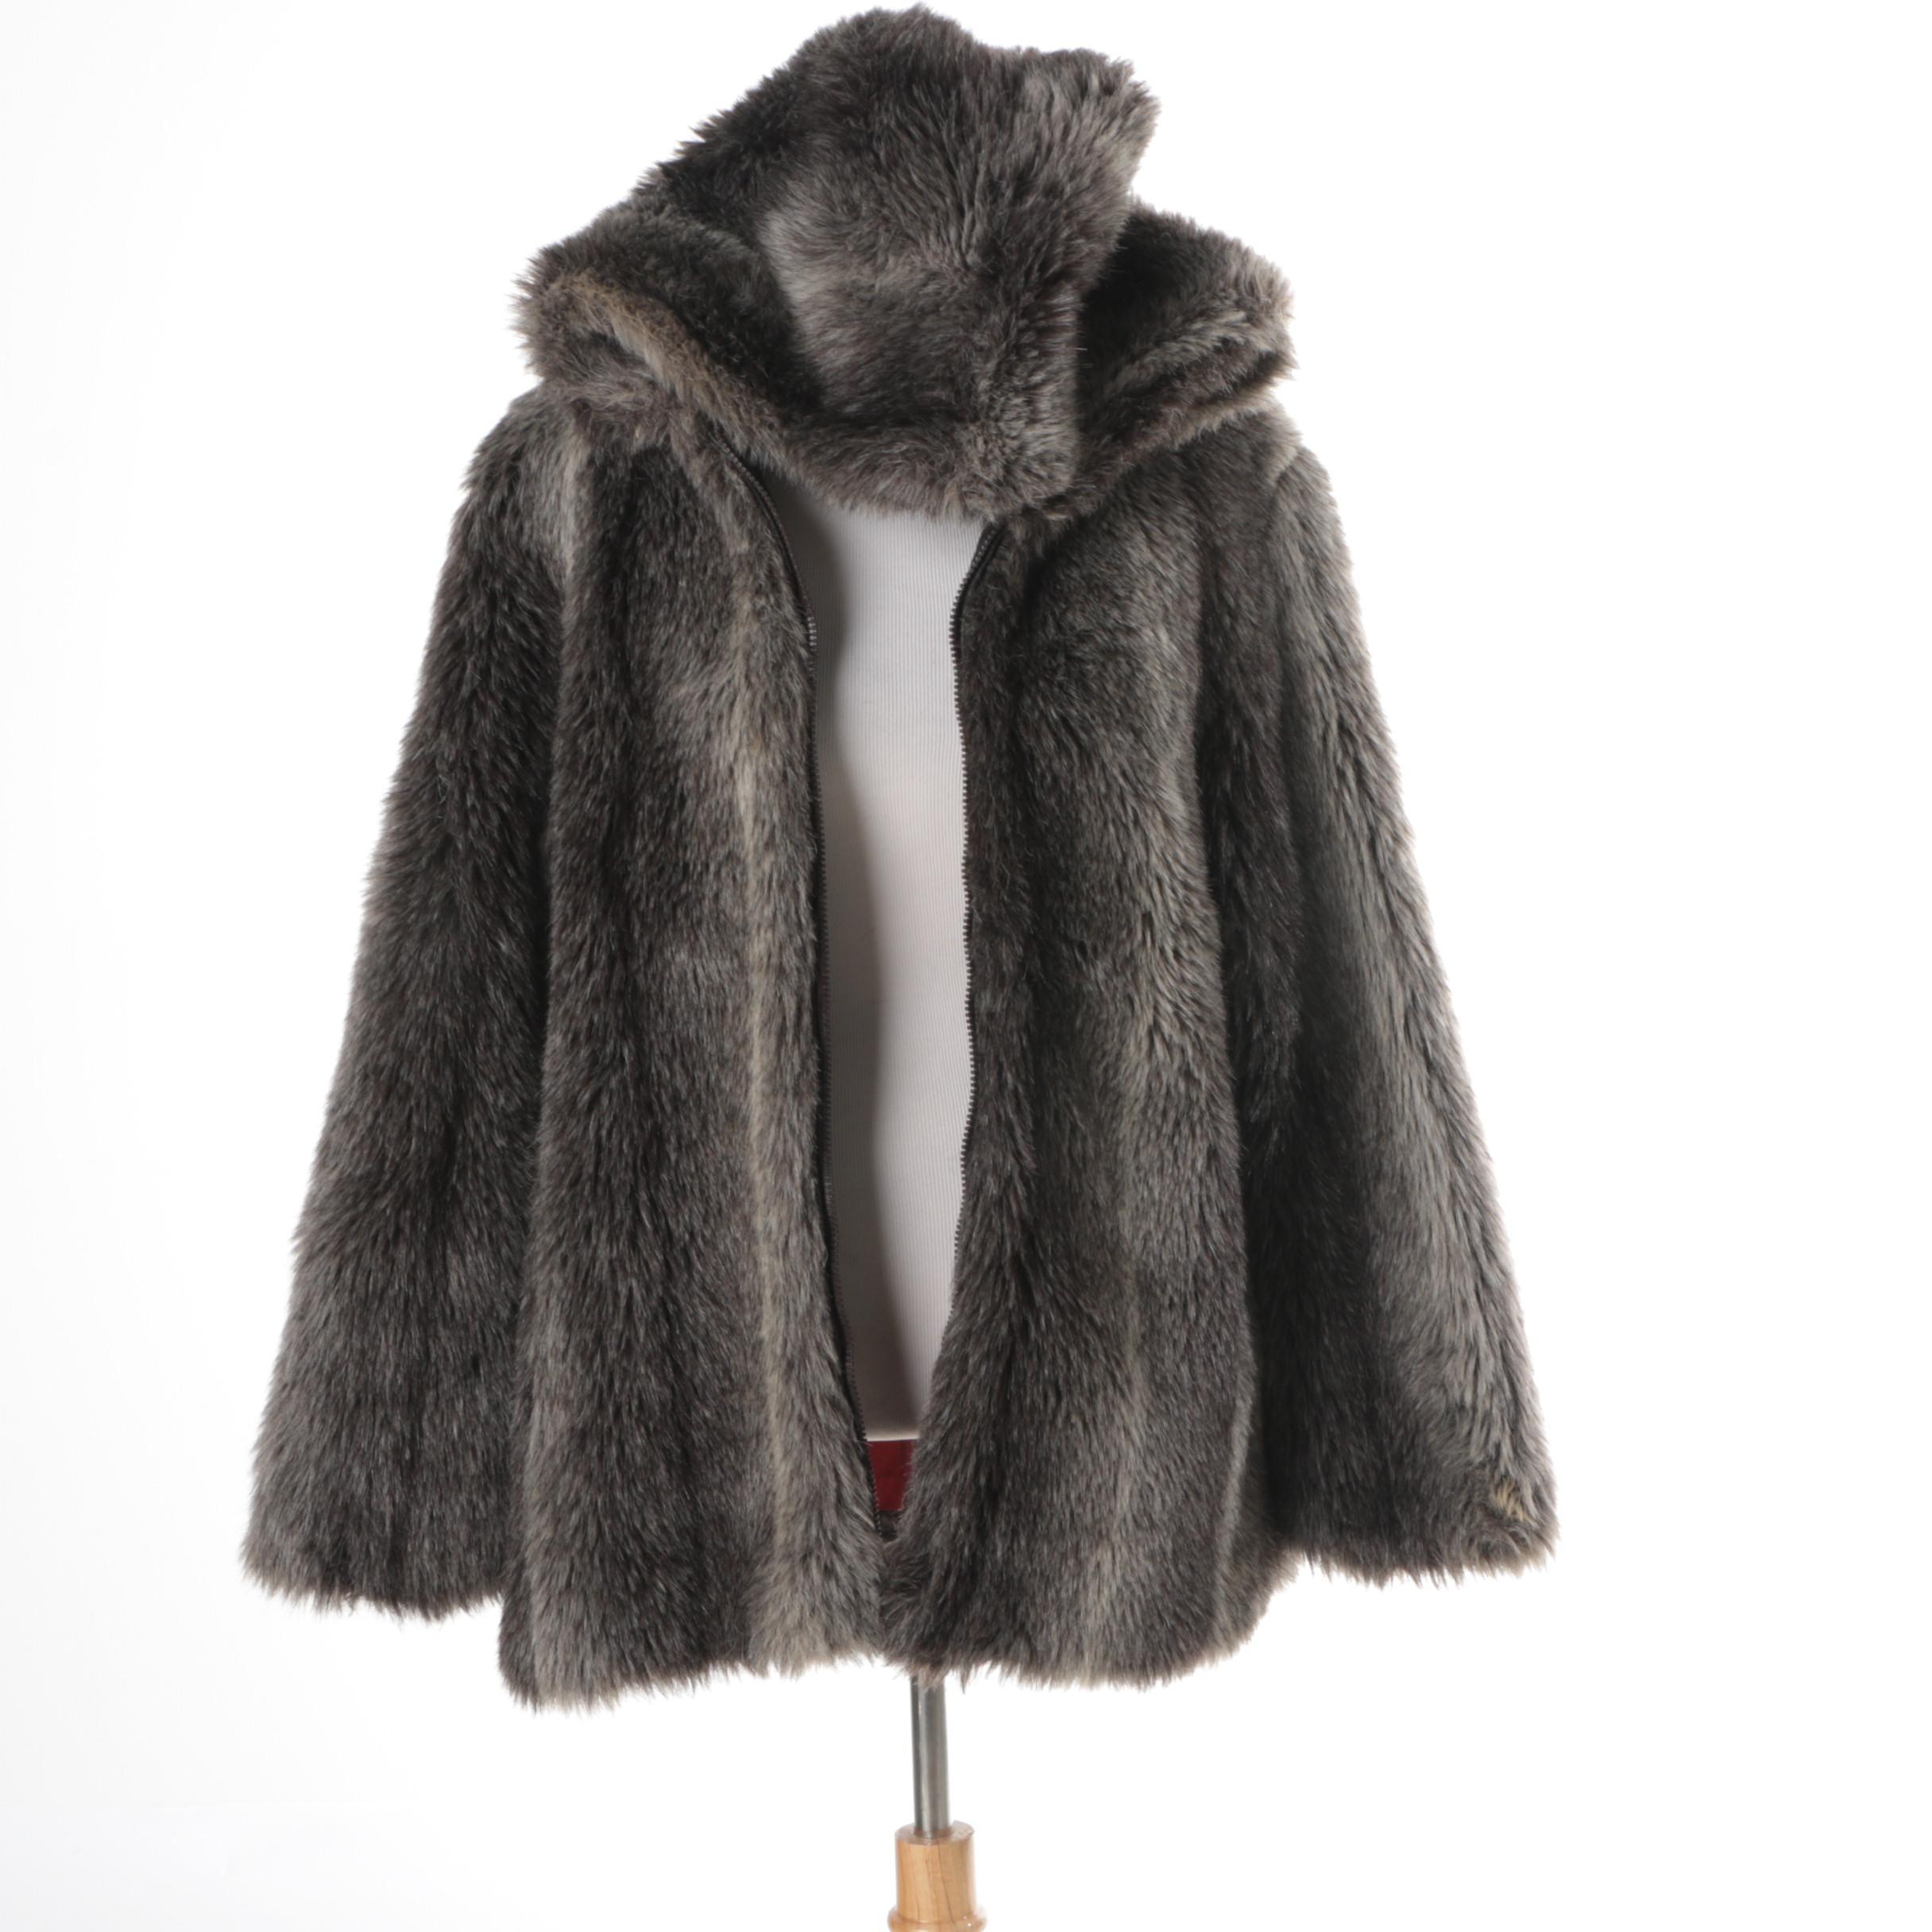 Women's Vintage Sears Fashions Faux Fur Coat